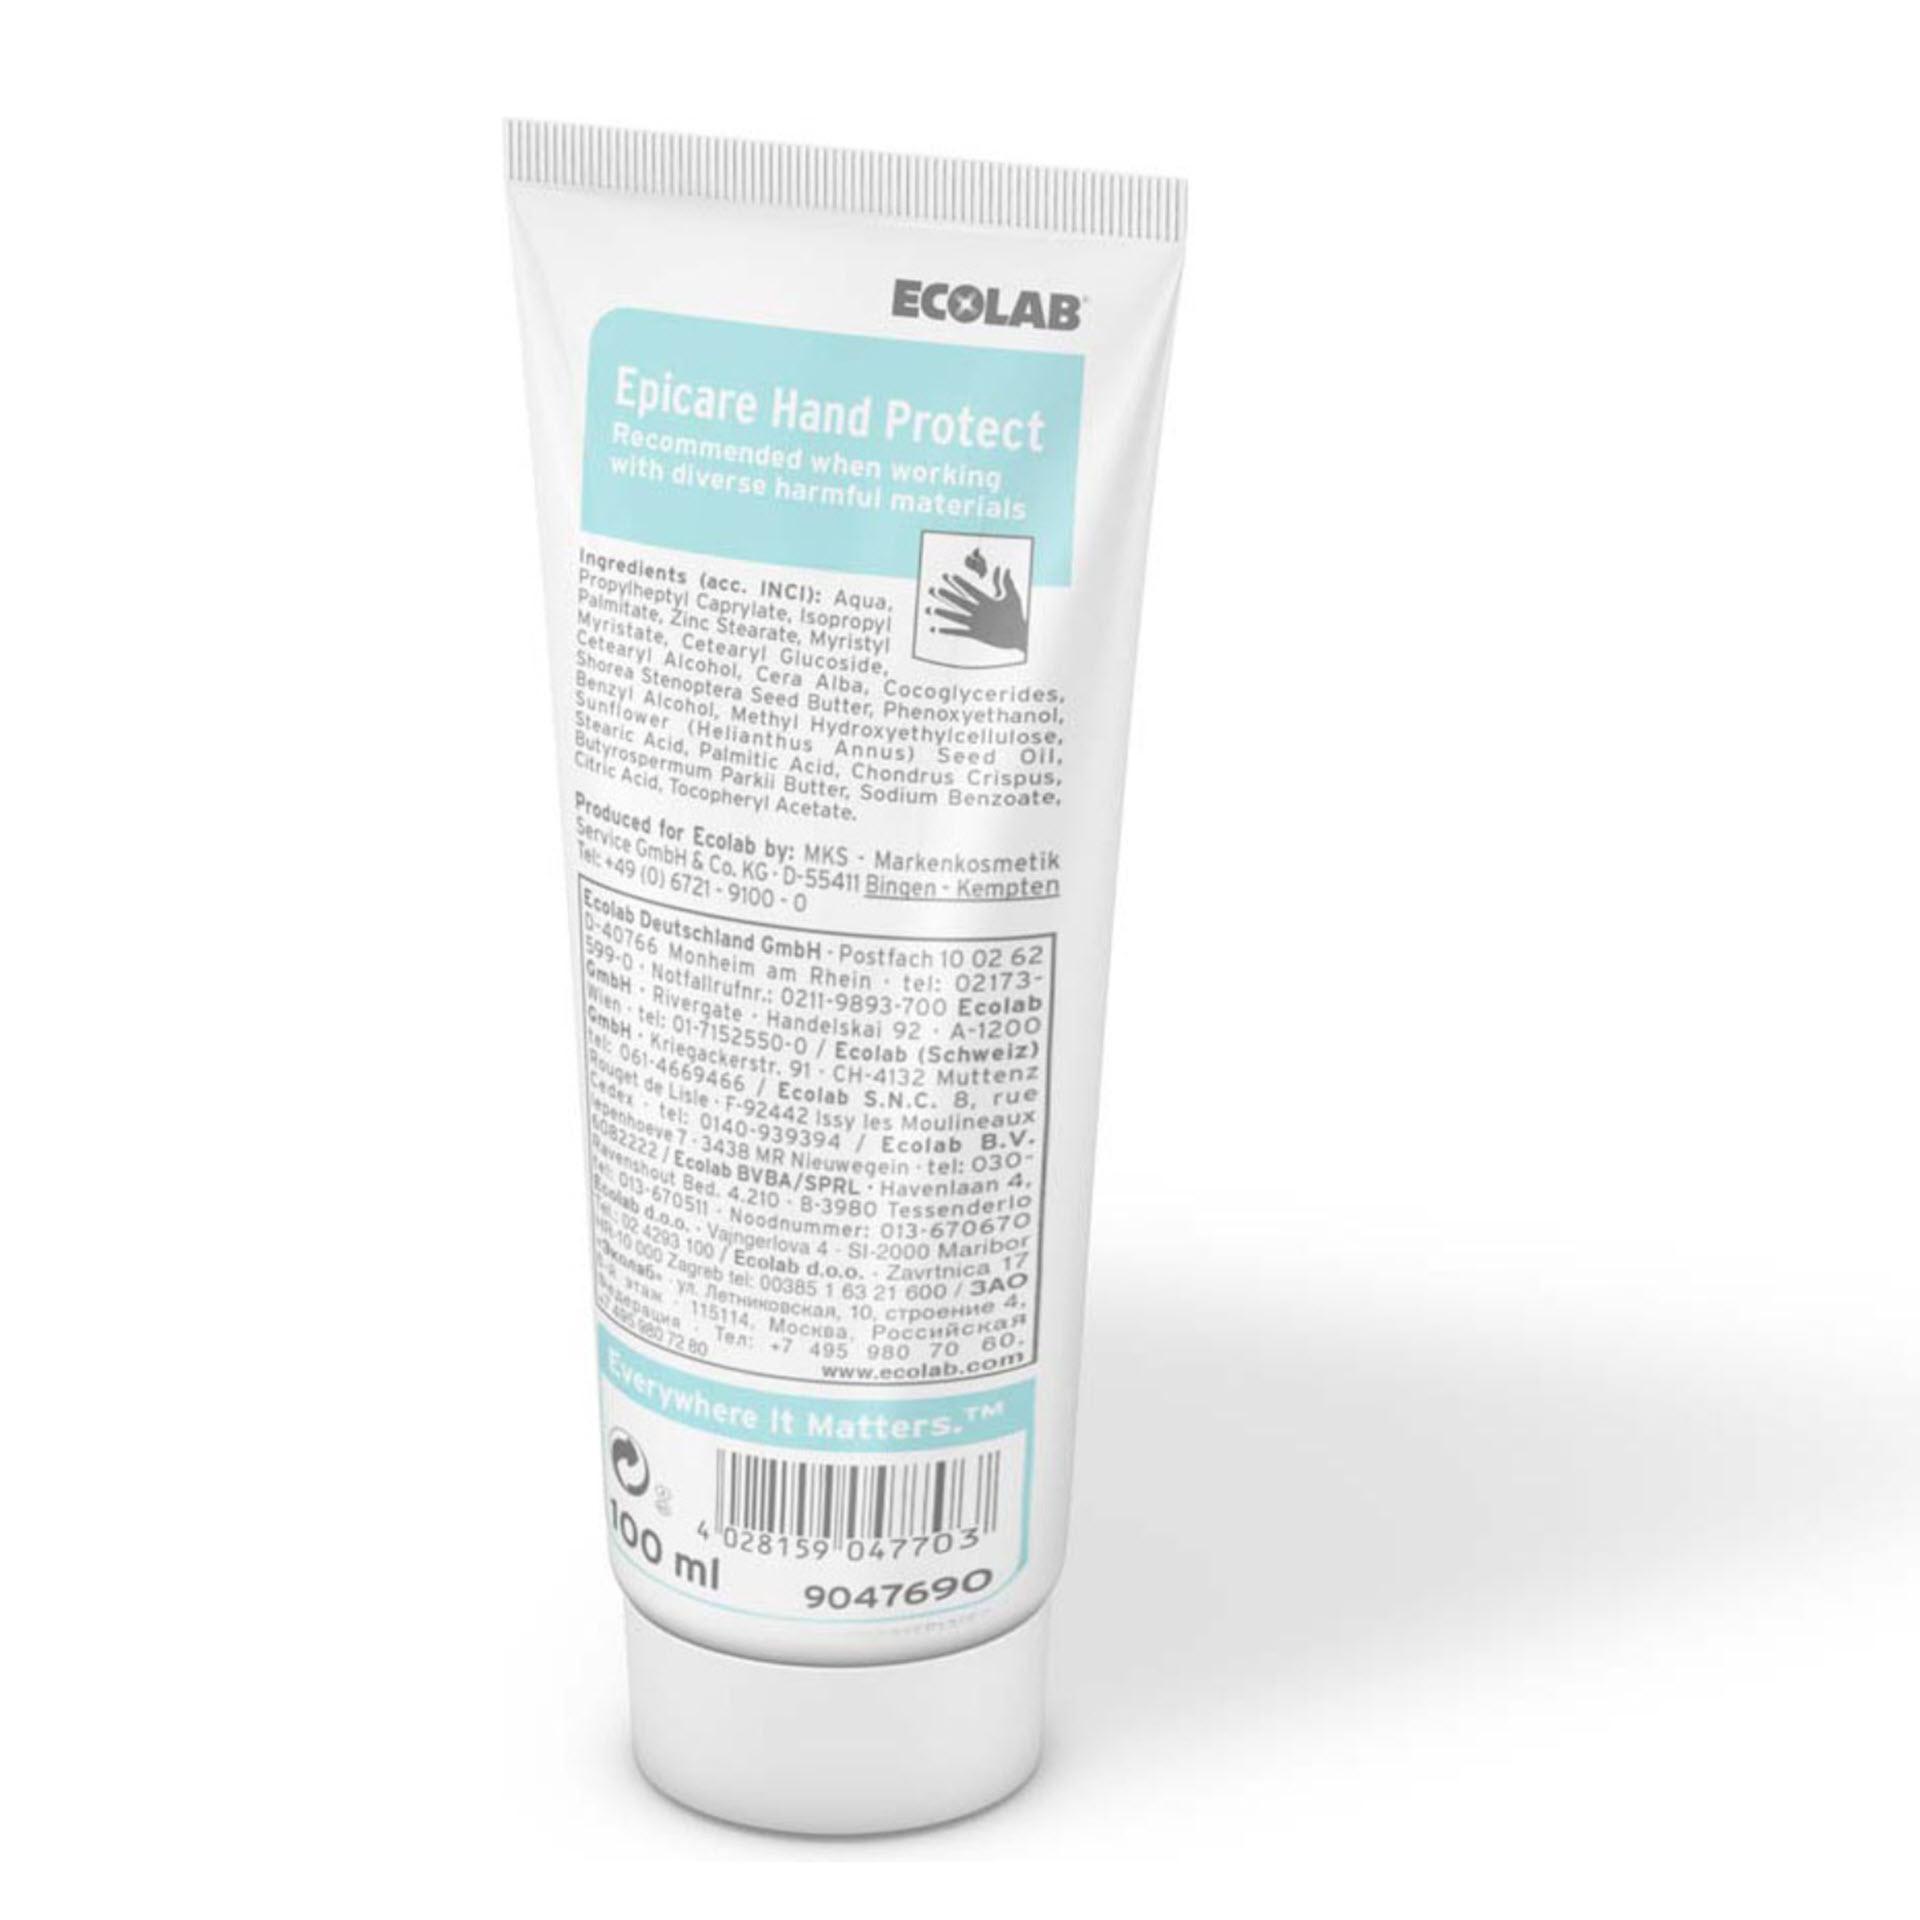 ECOLAB Epicare Hand Protect Hautschutzcreme - 100 ml Tube